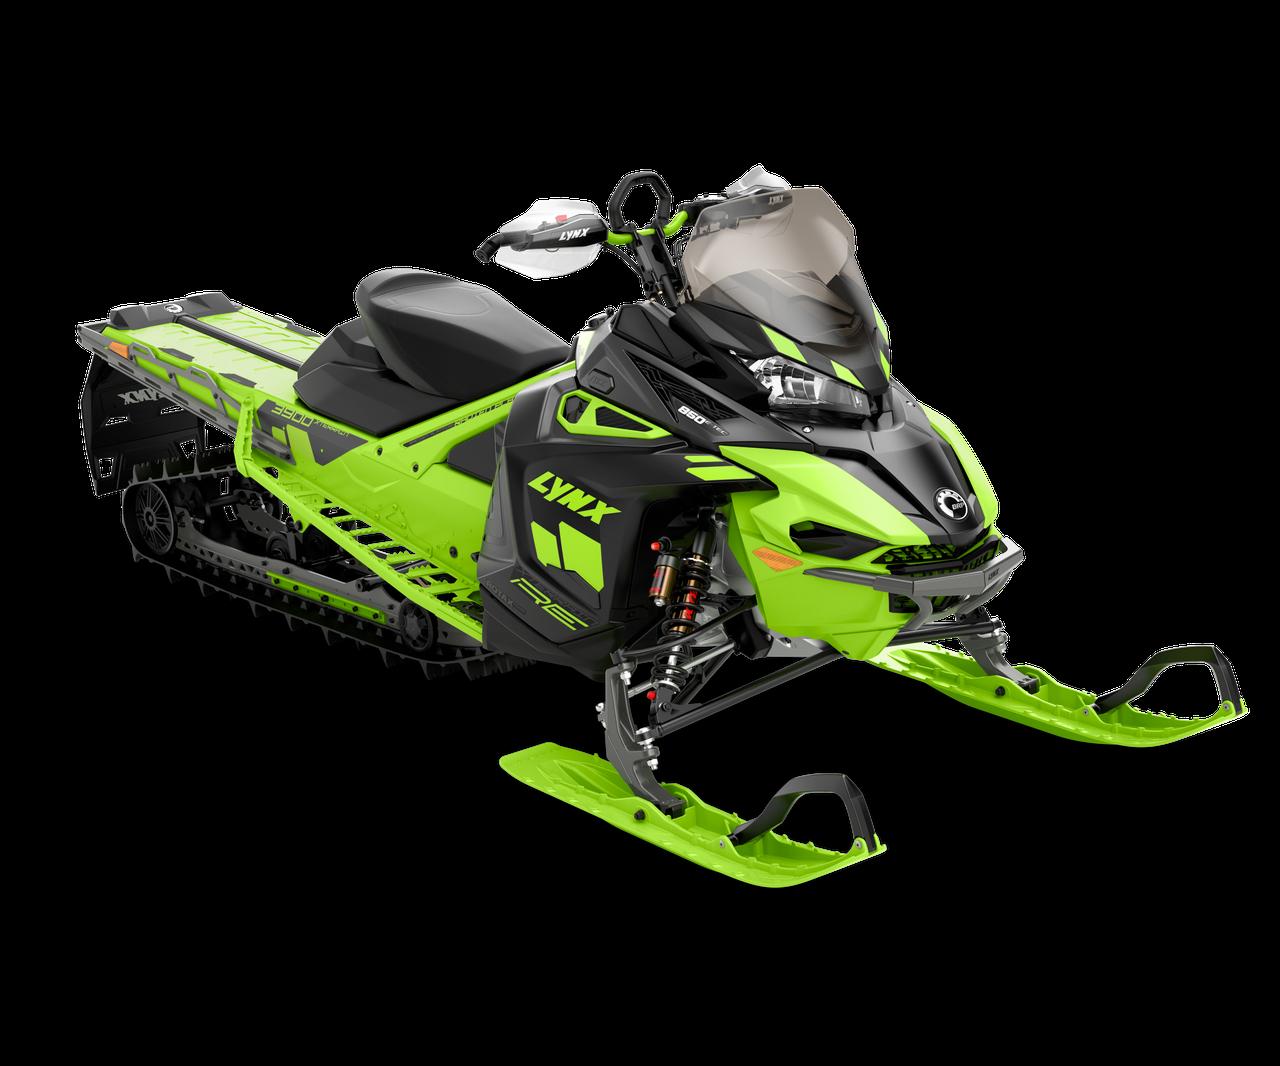 Снегоход XTerrain RE 3700 900 ACE Turbo Черно-зеленый 2021